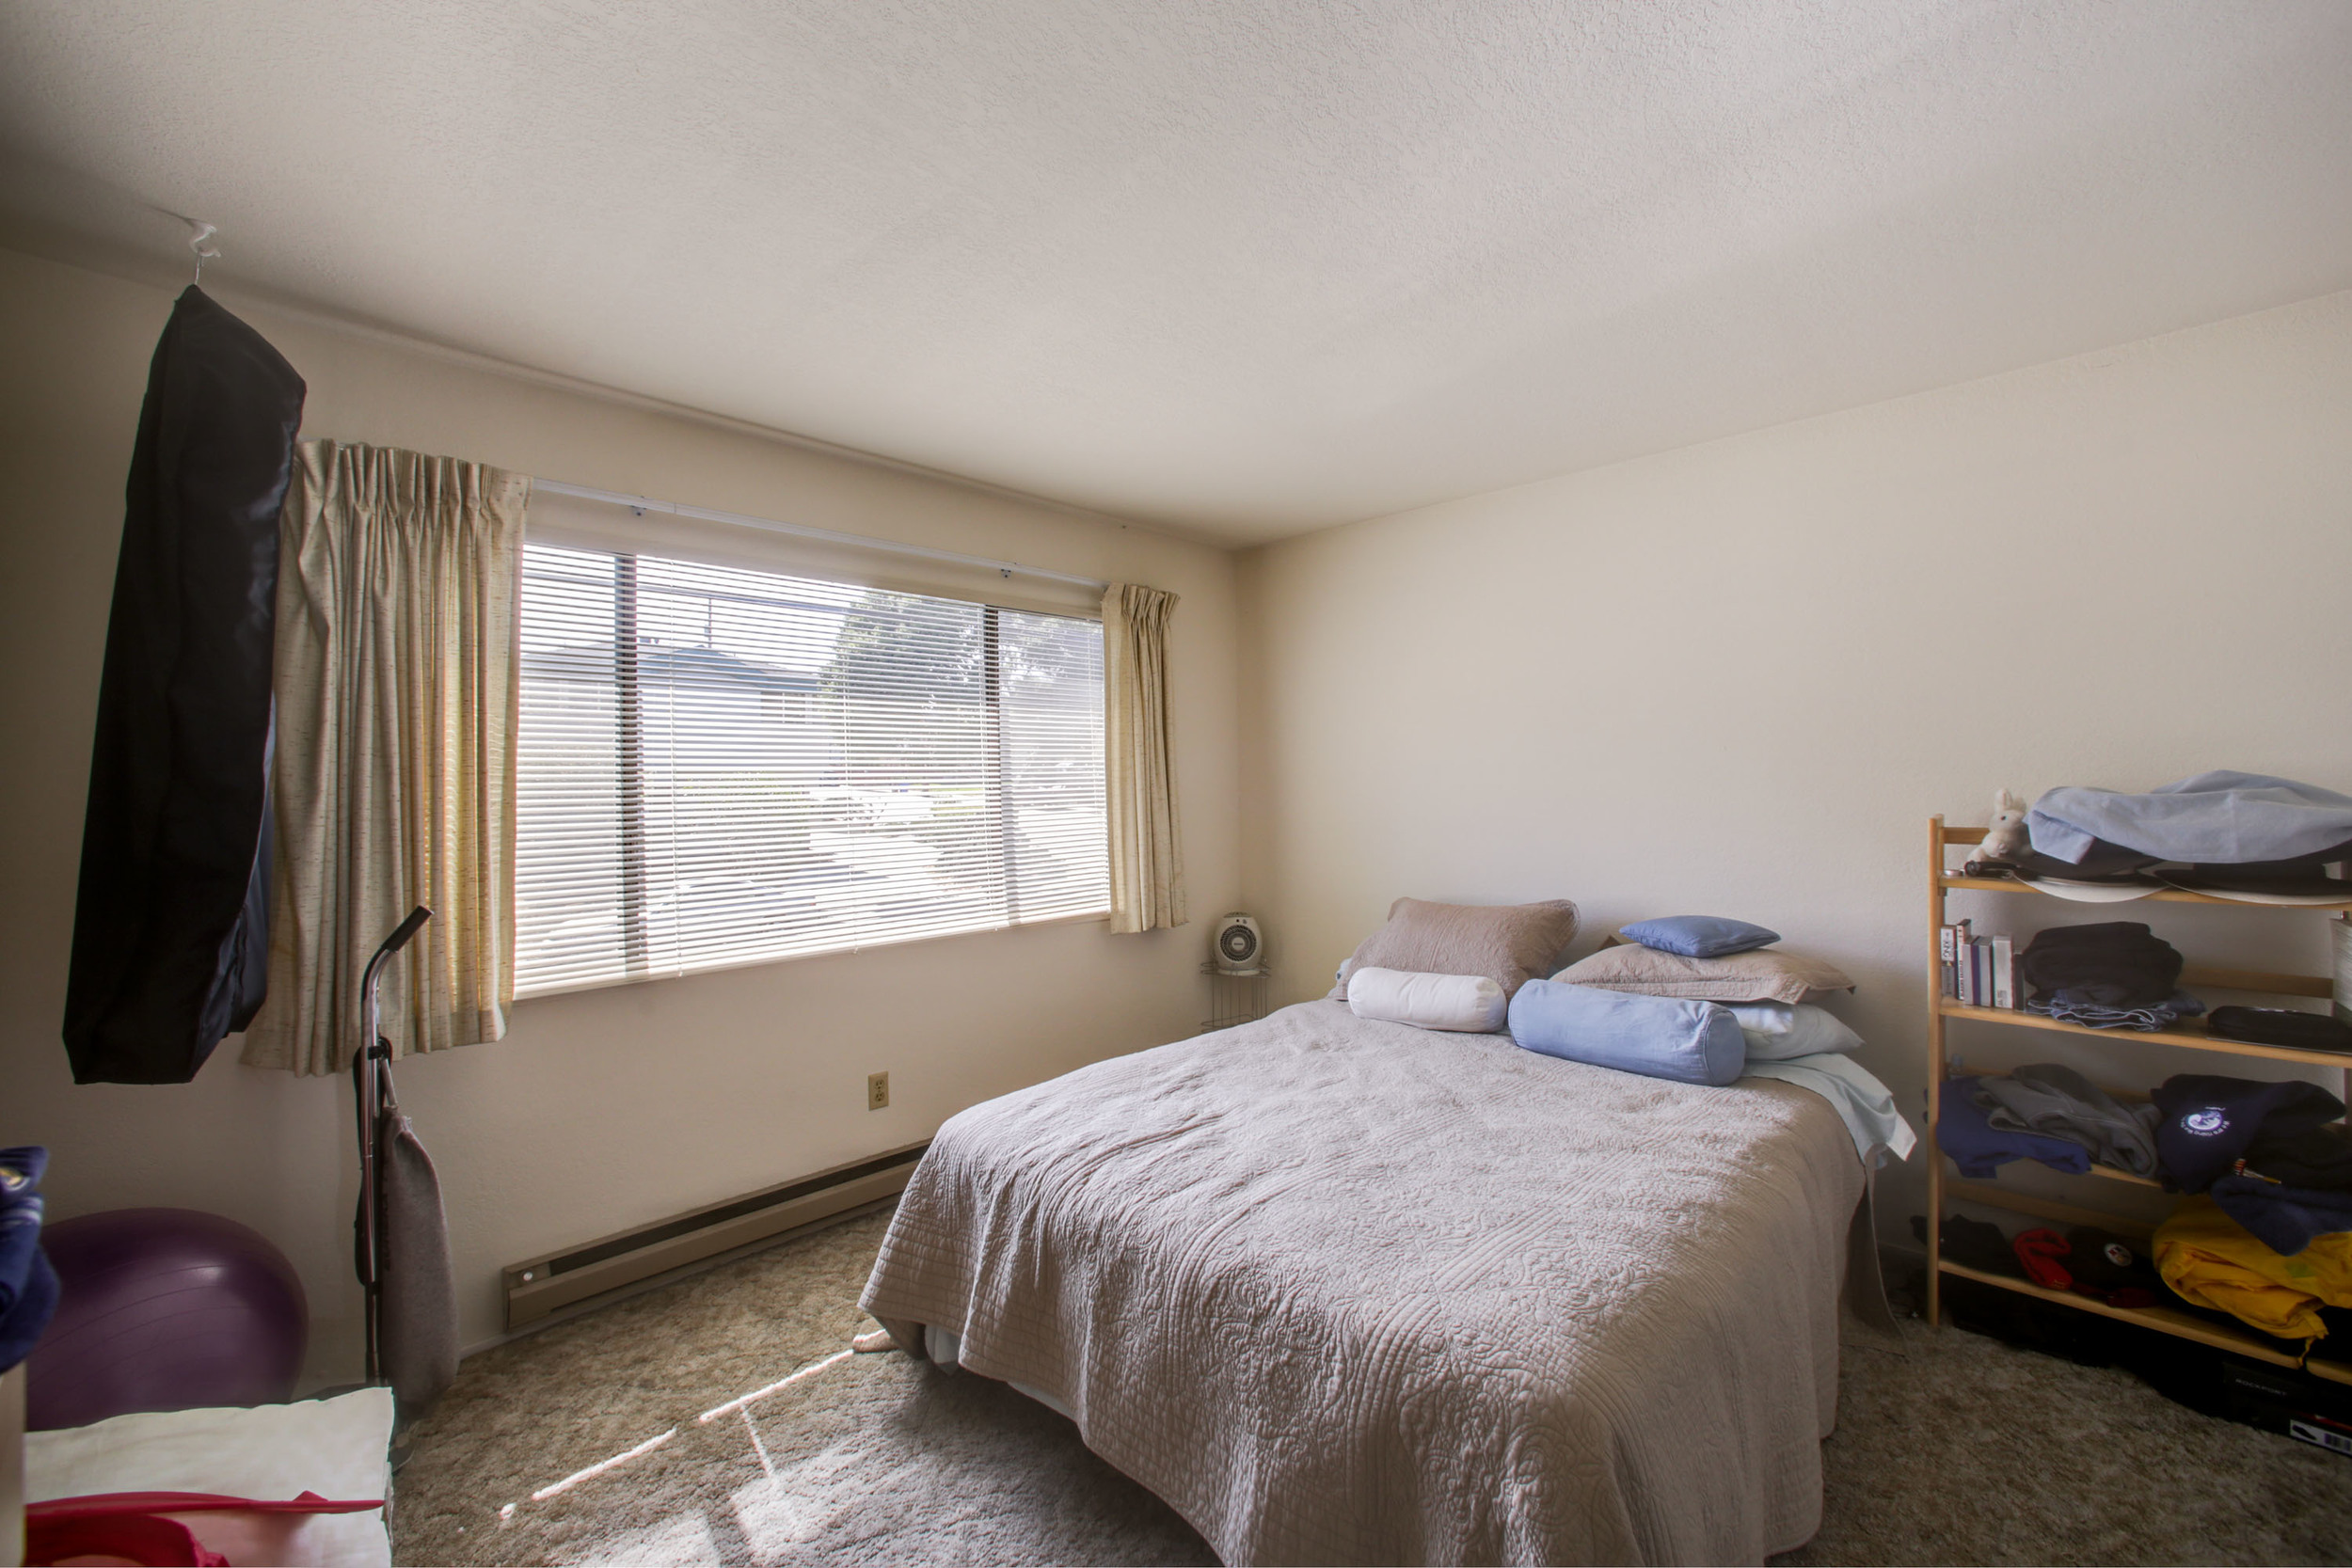 Unit C bedroom-17.jpg